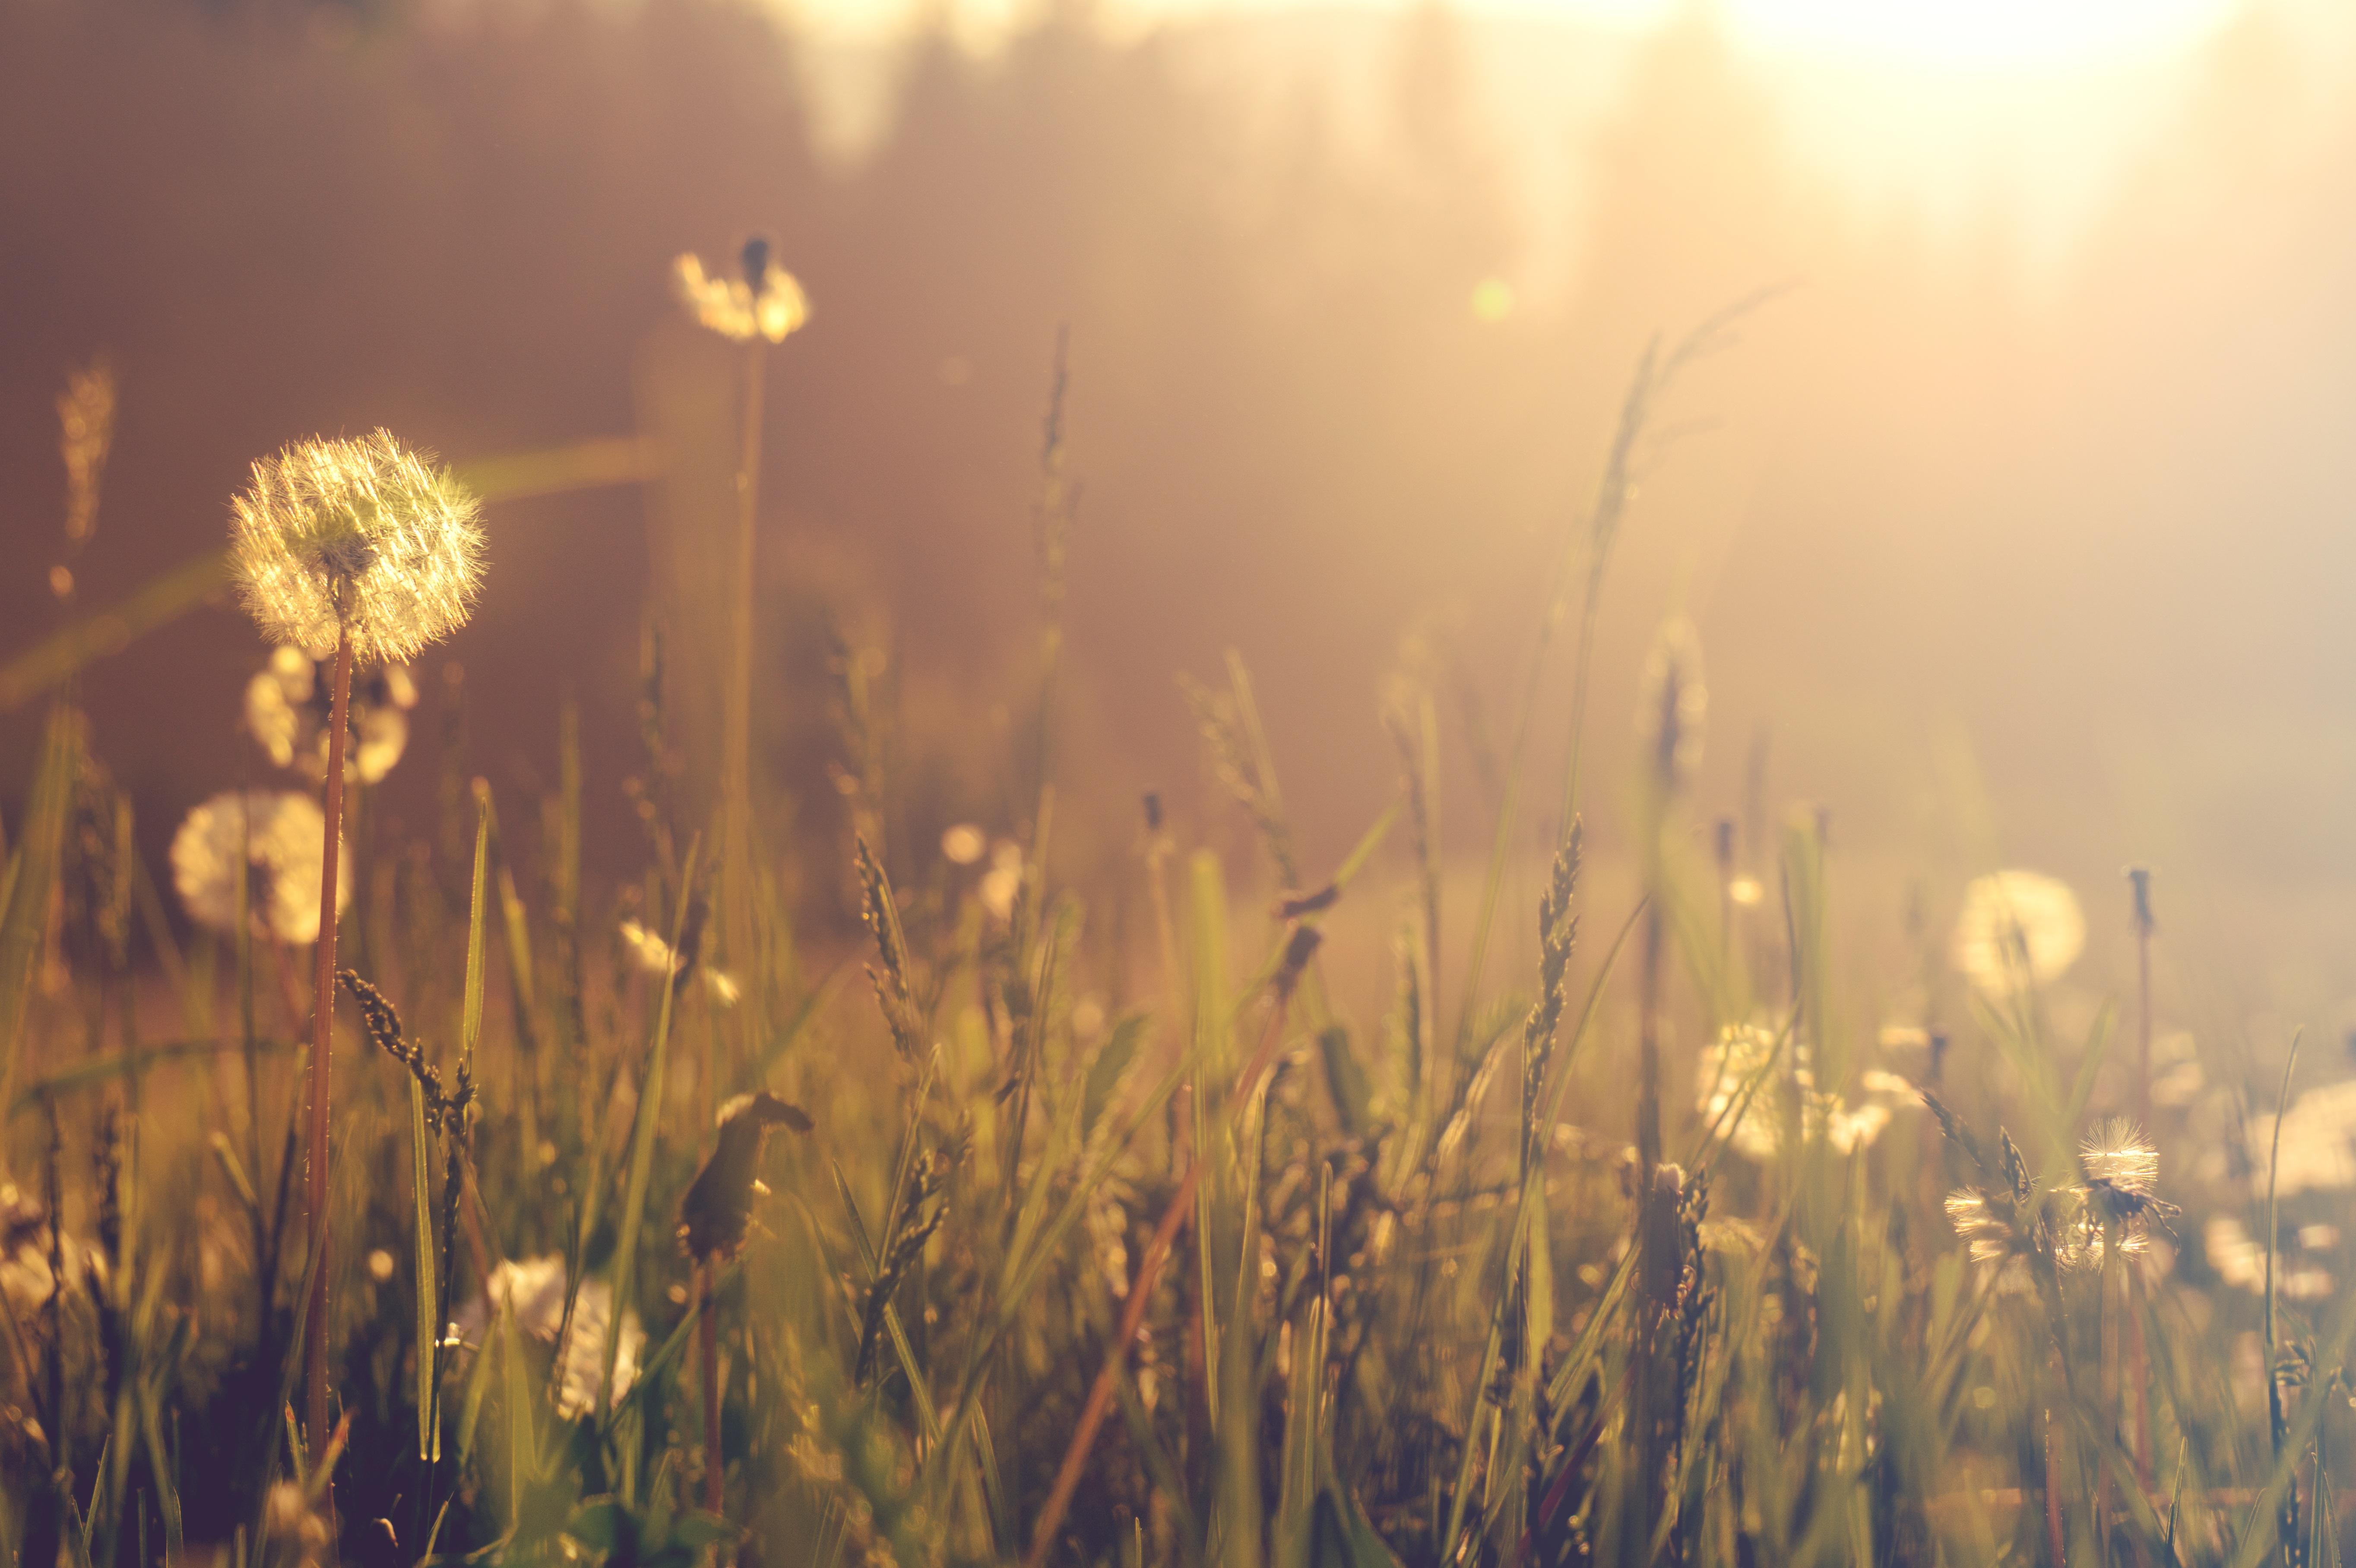 выдерживают стрижку, картинка утро трава природа глупости